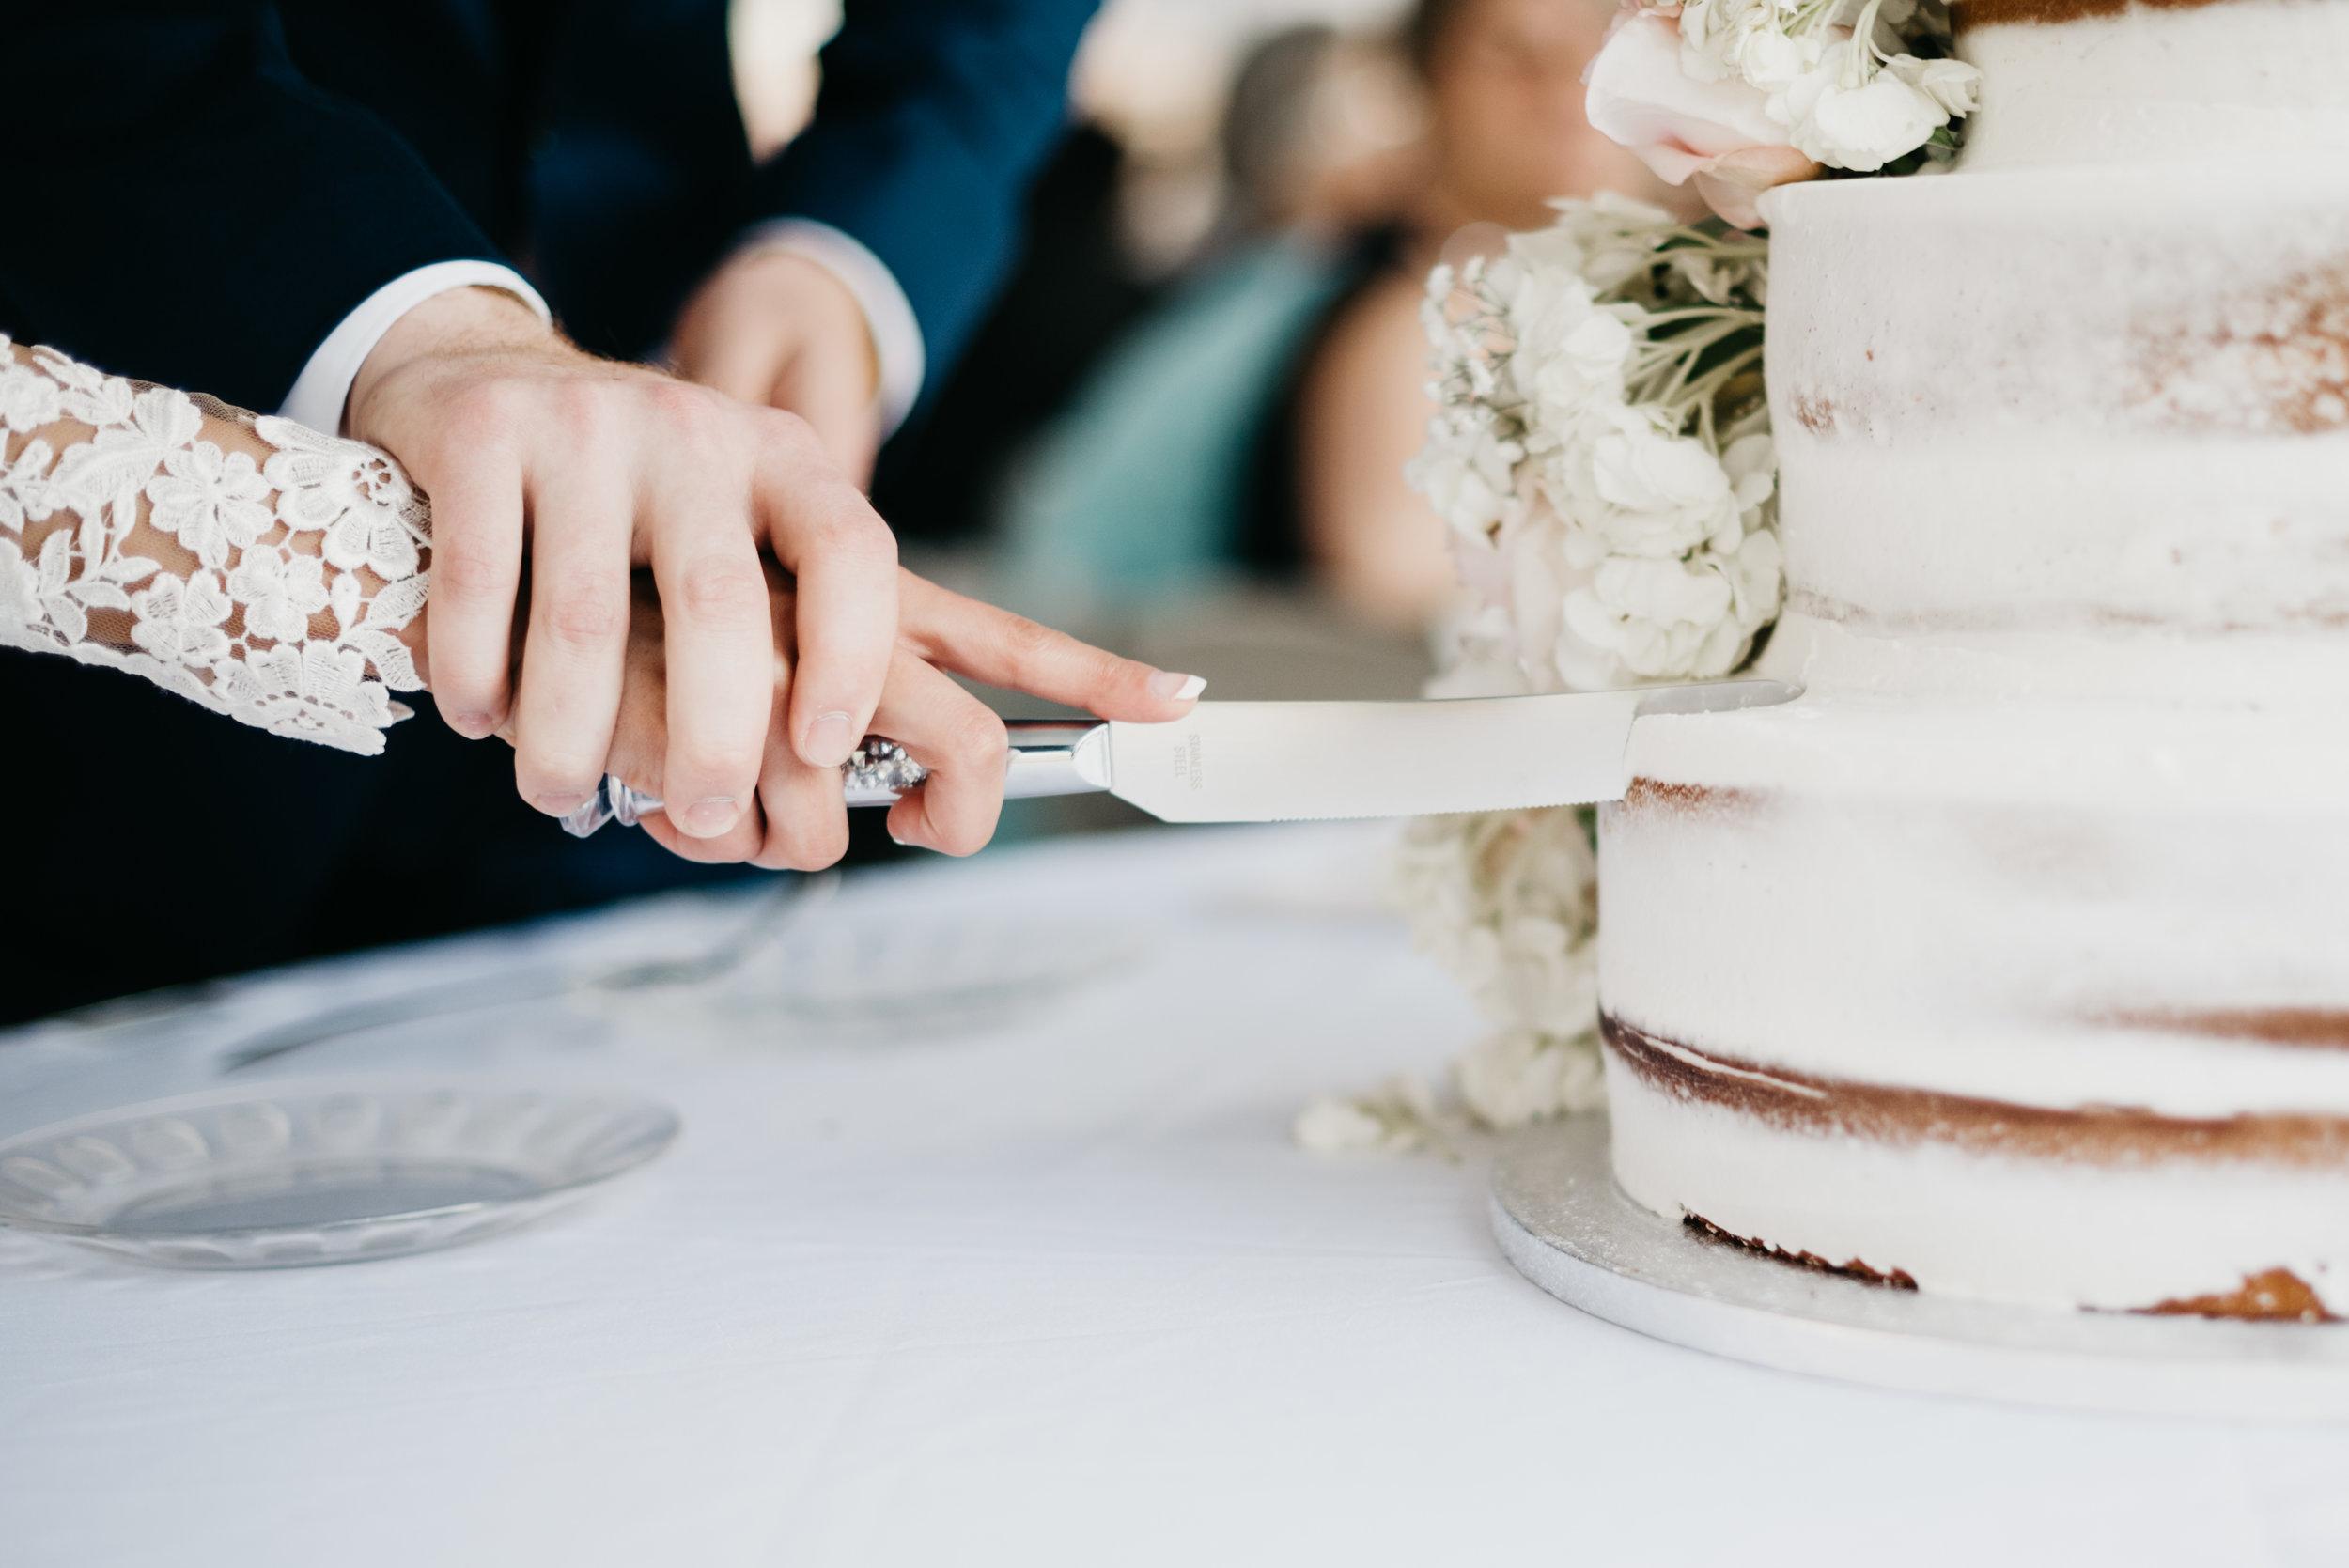 Barch-Massachusetts-Lakeside Tent Wedding-Western Massachusetts Wedding Photographer-02498.jpg